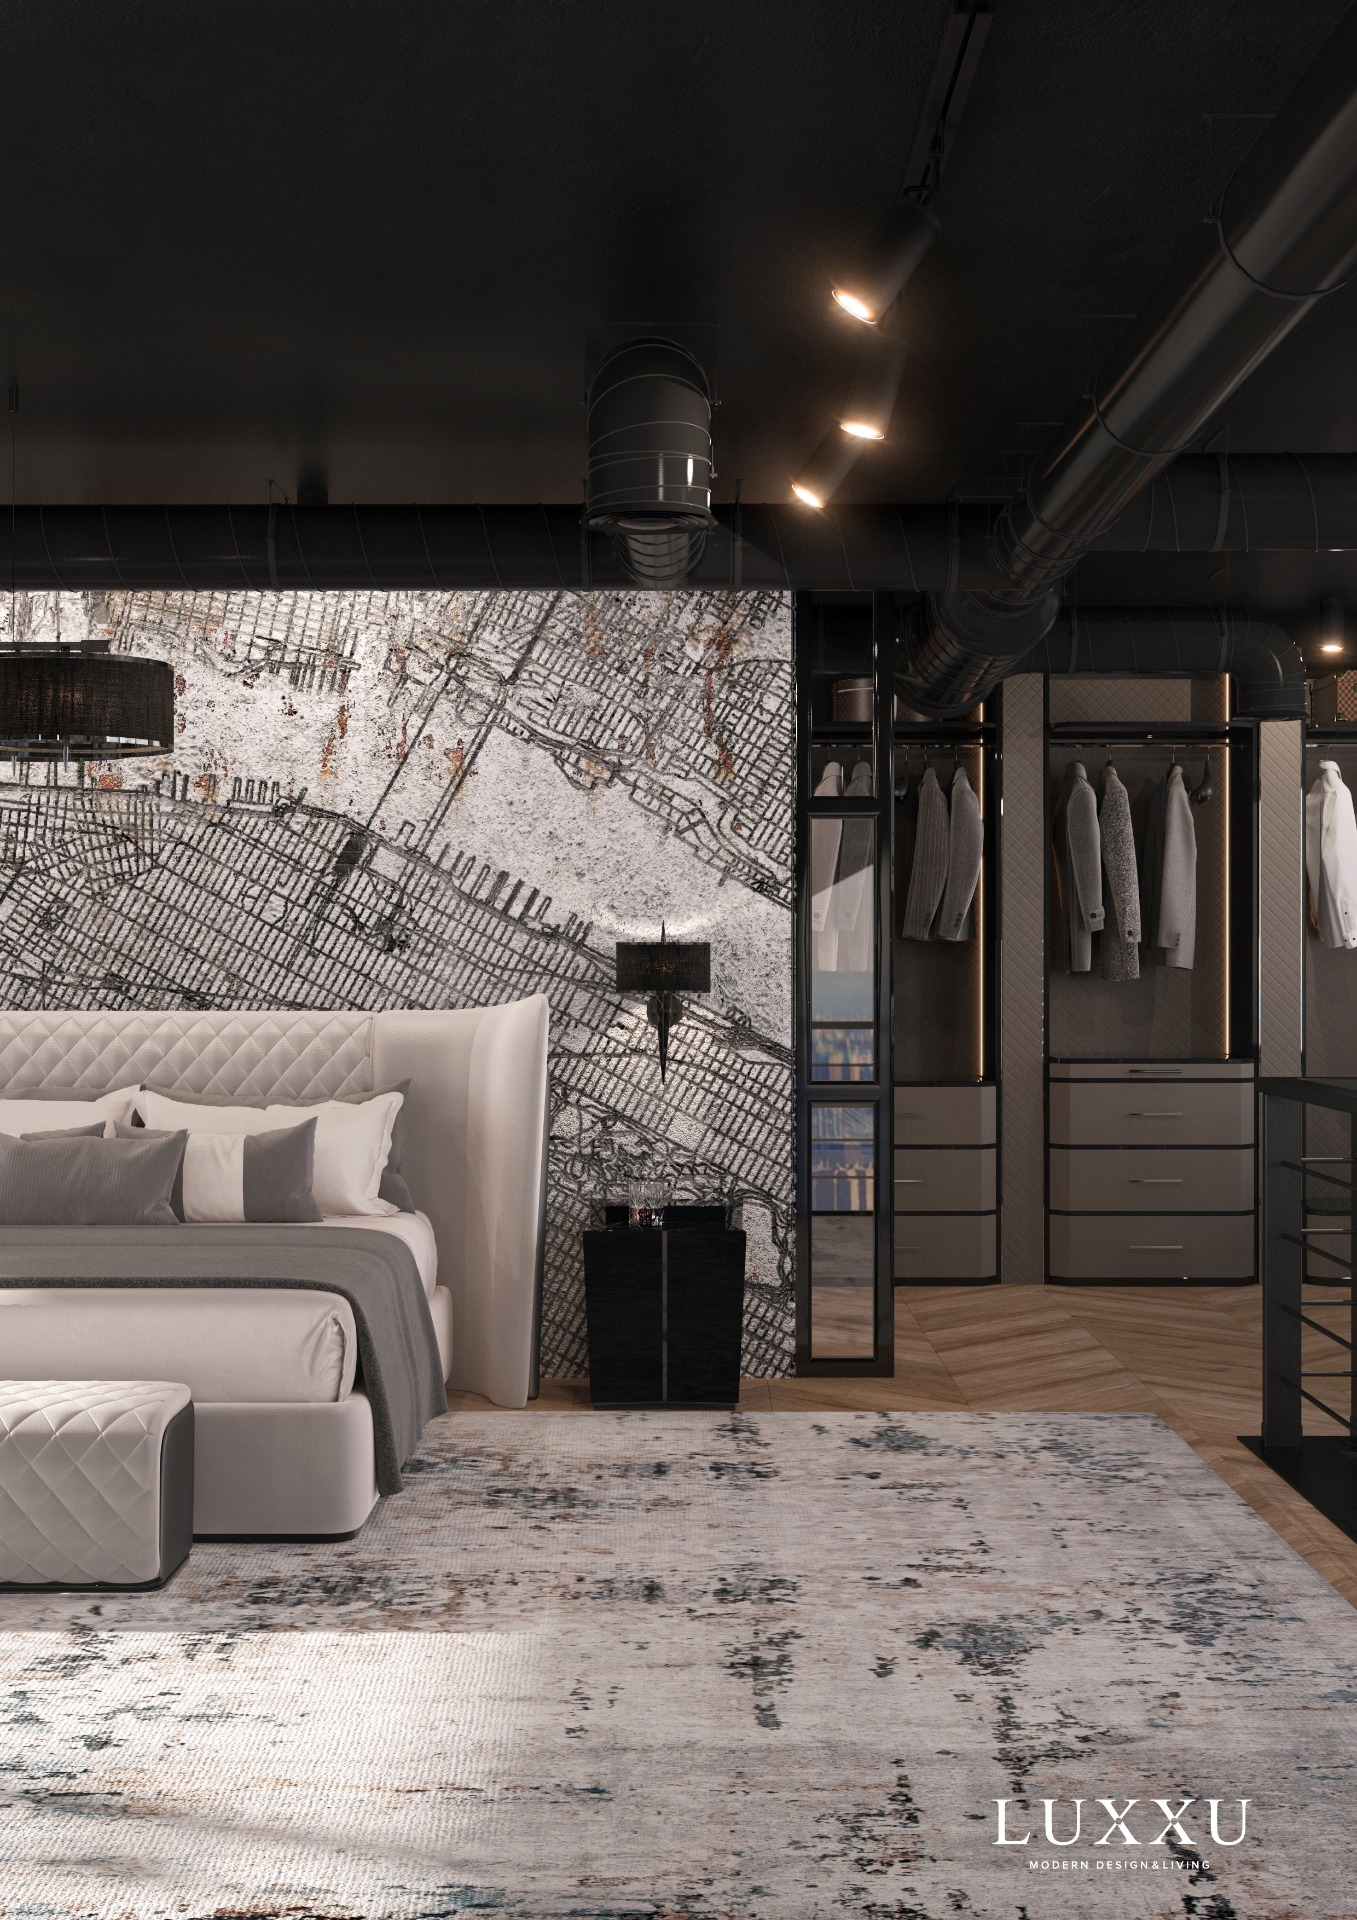 Modern Bedroom Design - Contemporary Comfort In The Big Apple